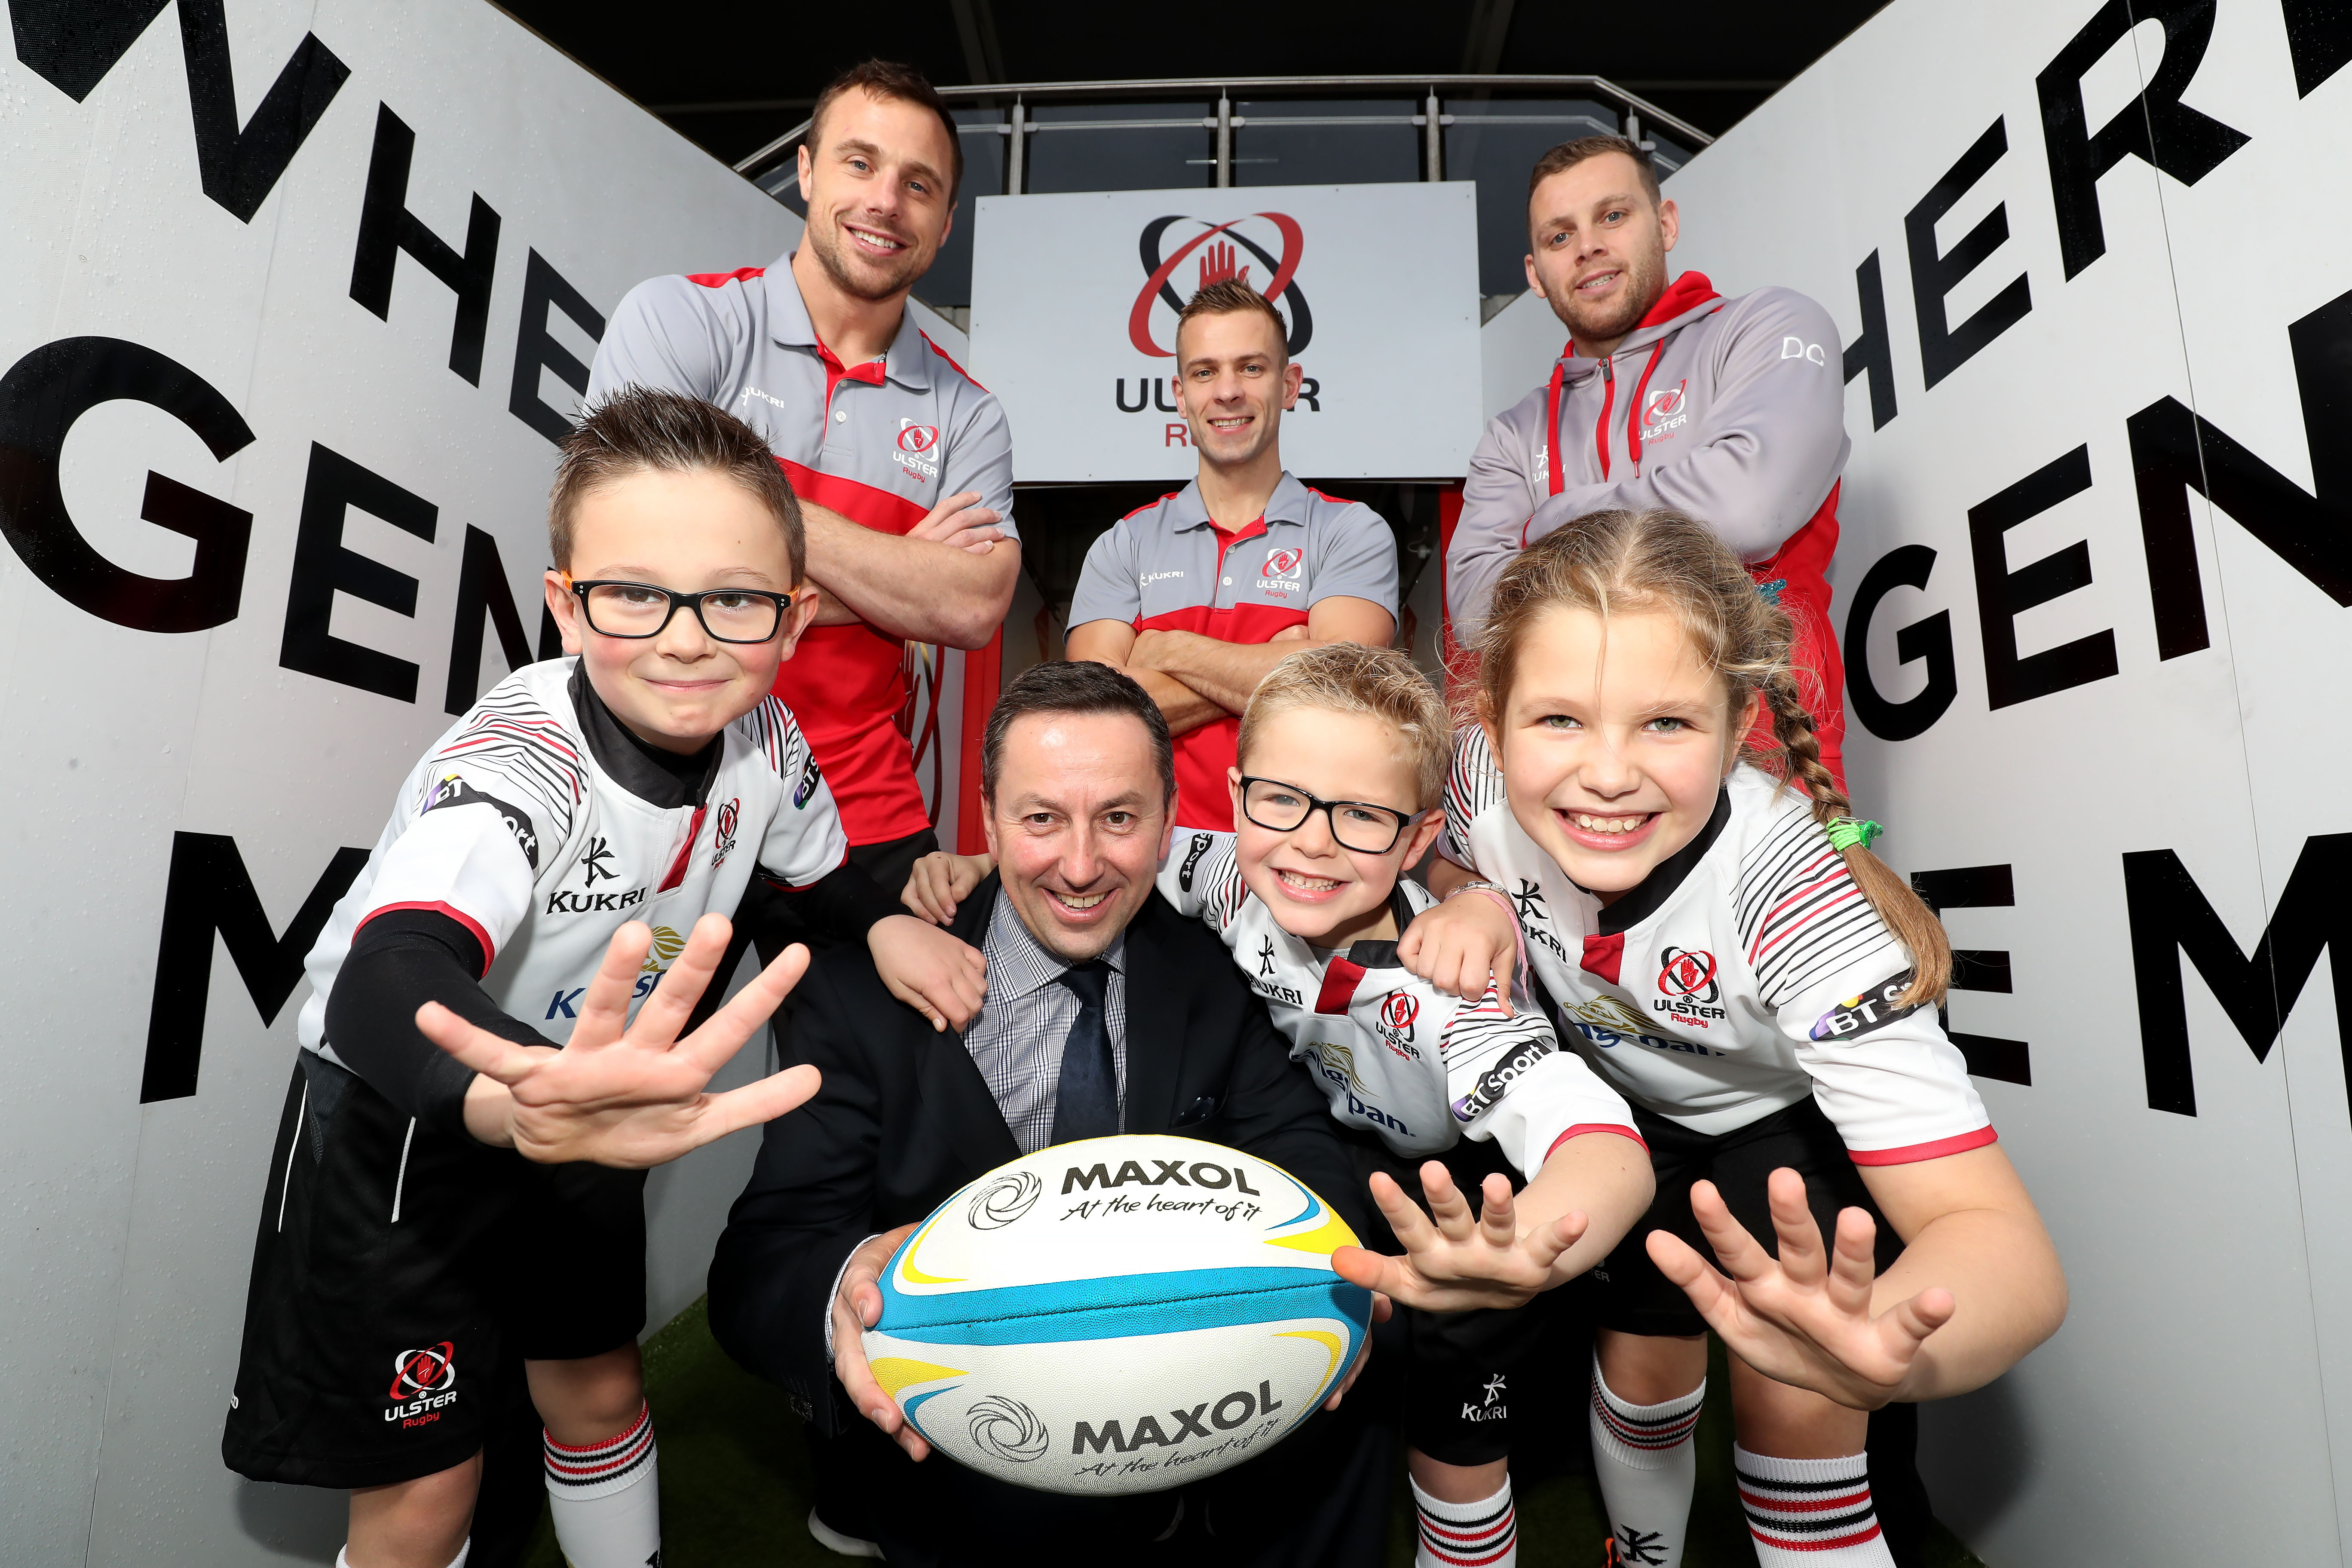 Maxol renew sponsorship of Ulster Mini Rugby